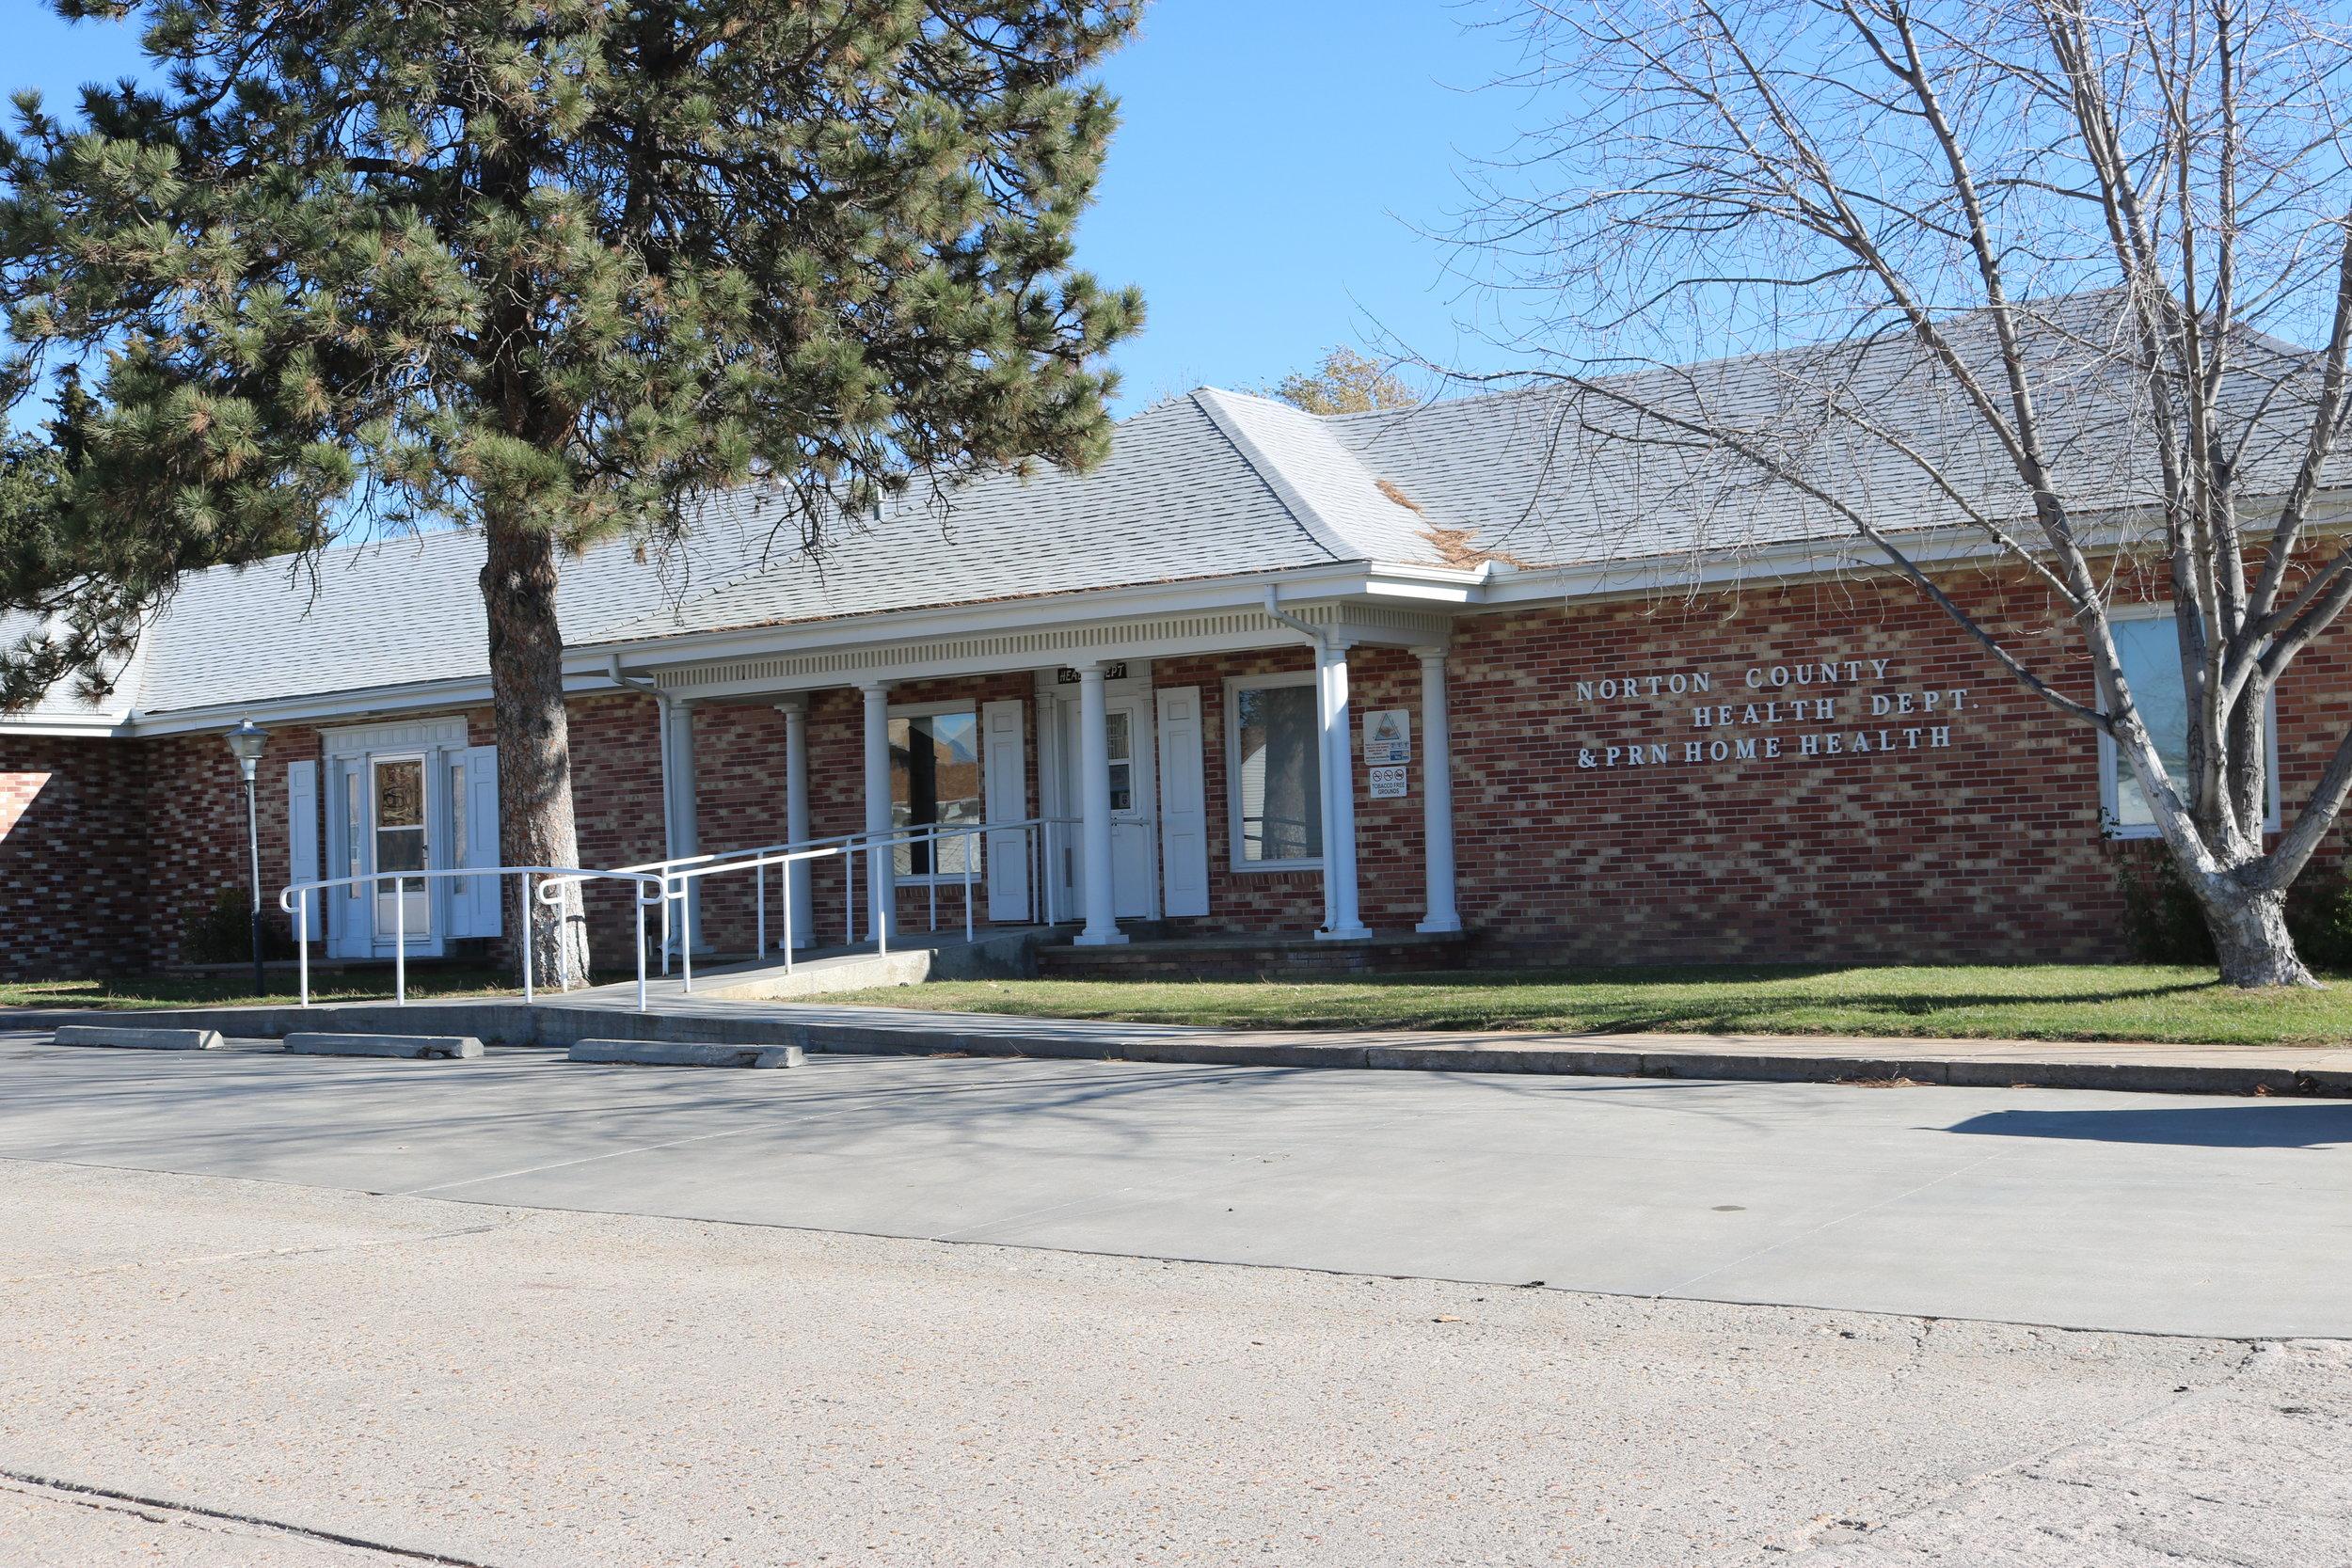 Norton County Health Department